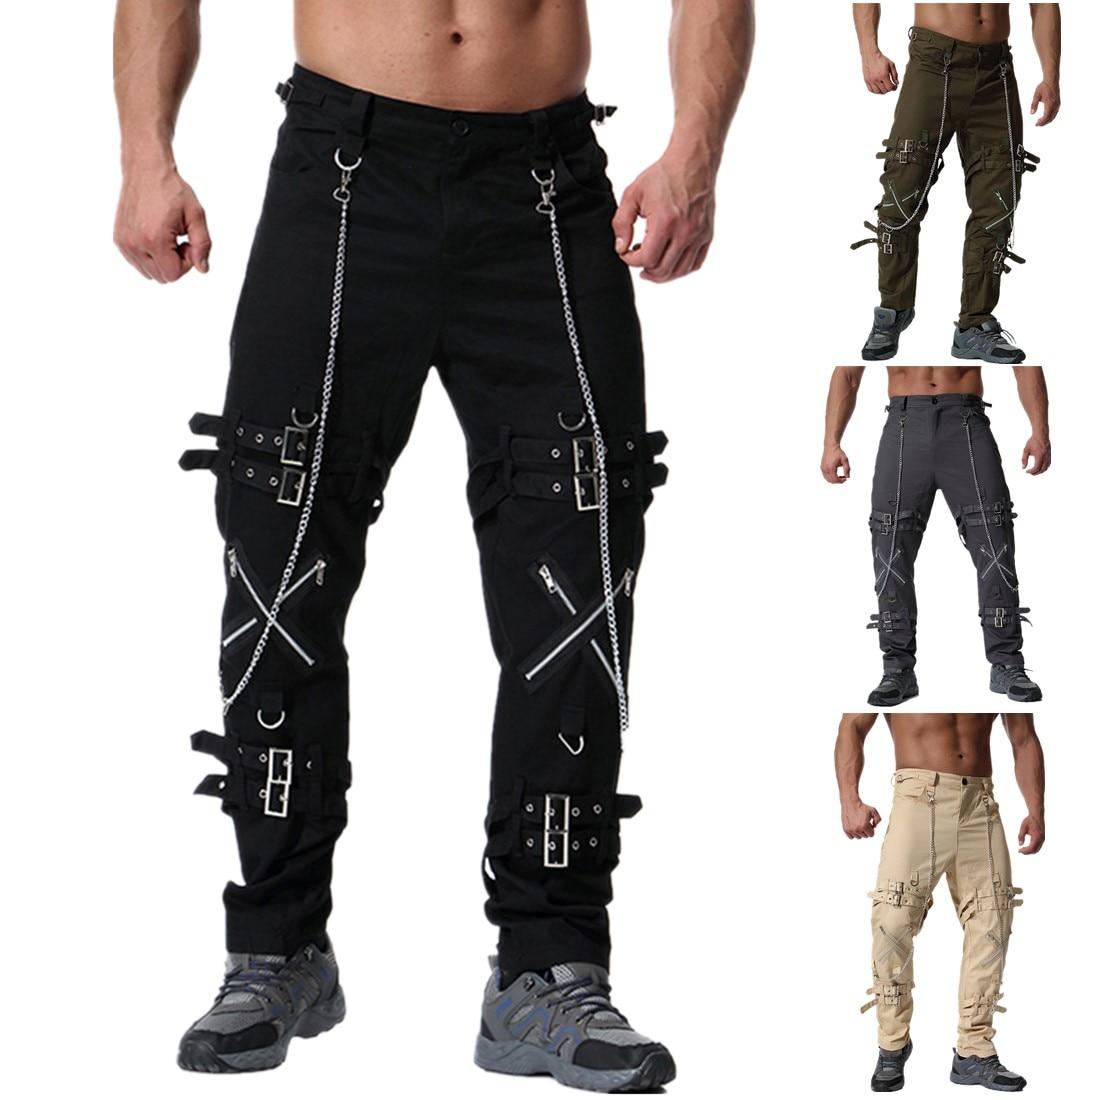 Pantalones para hombre, pantalones de chándal, pantalones de chándal, pantalones para hombre, hip hop, Camuflaje, pantalones tácticos de carga, Militar